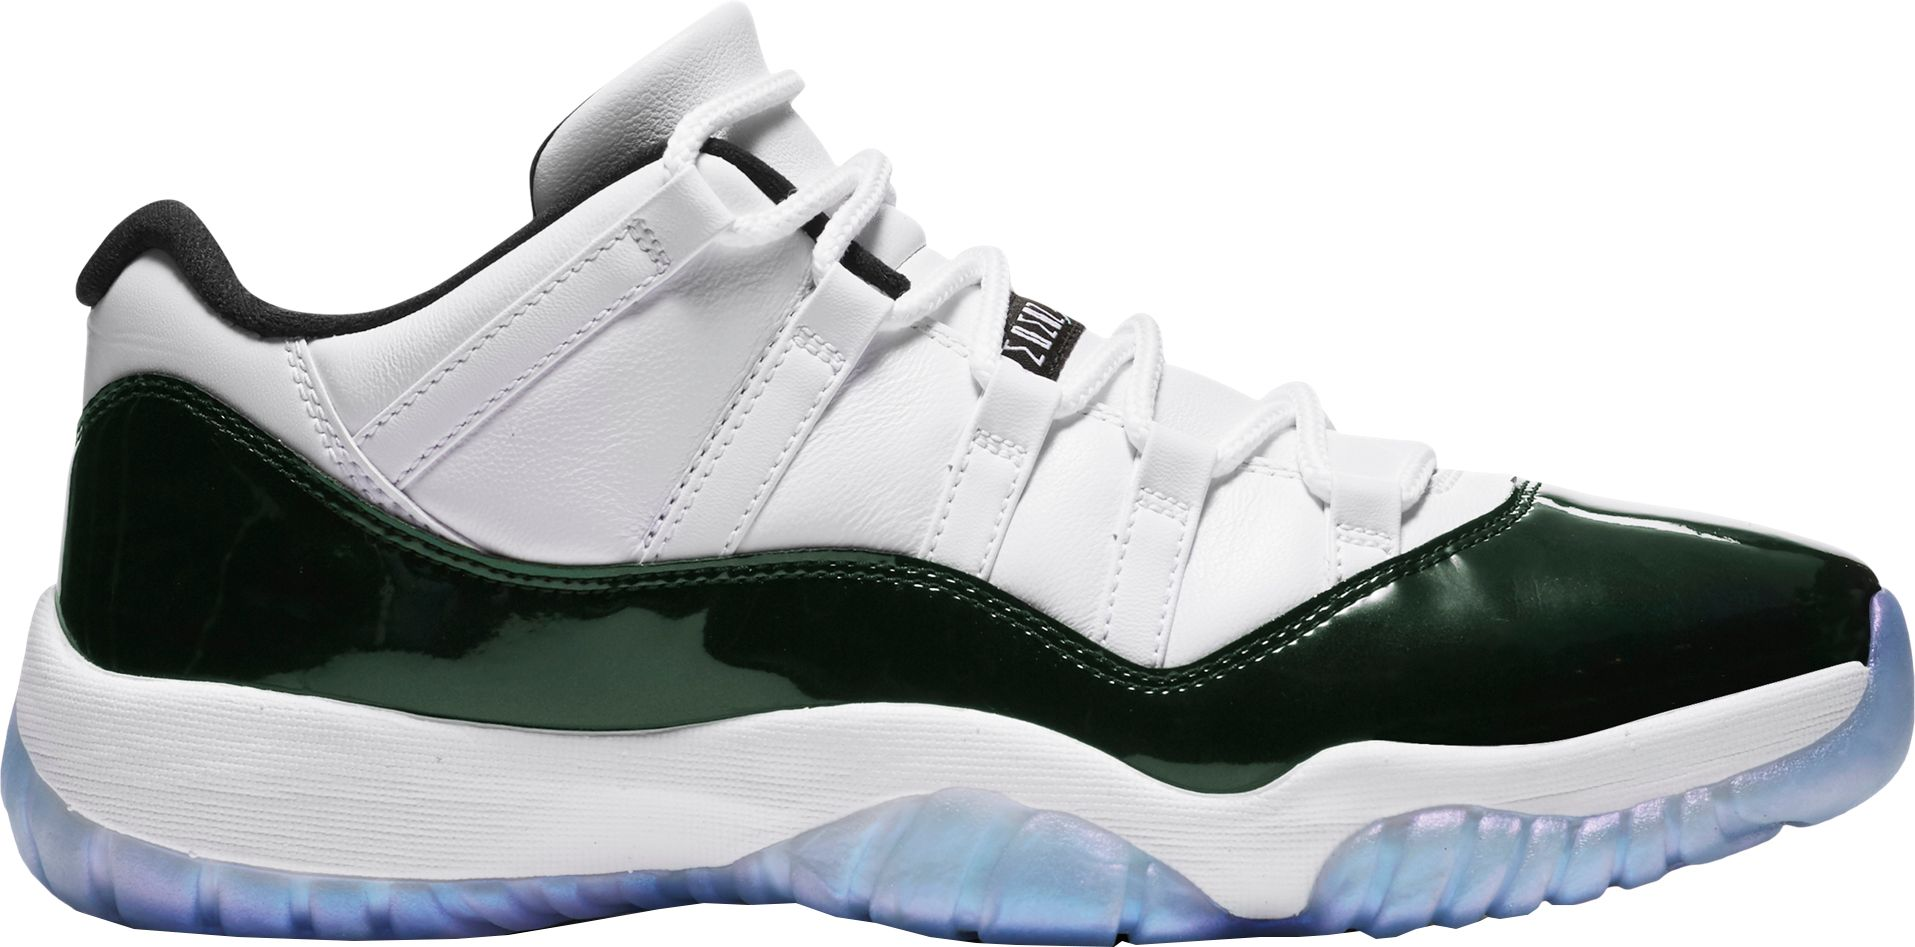 basketball shoes jordan 11